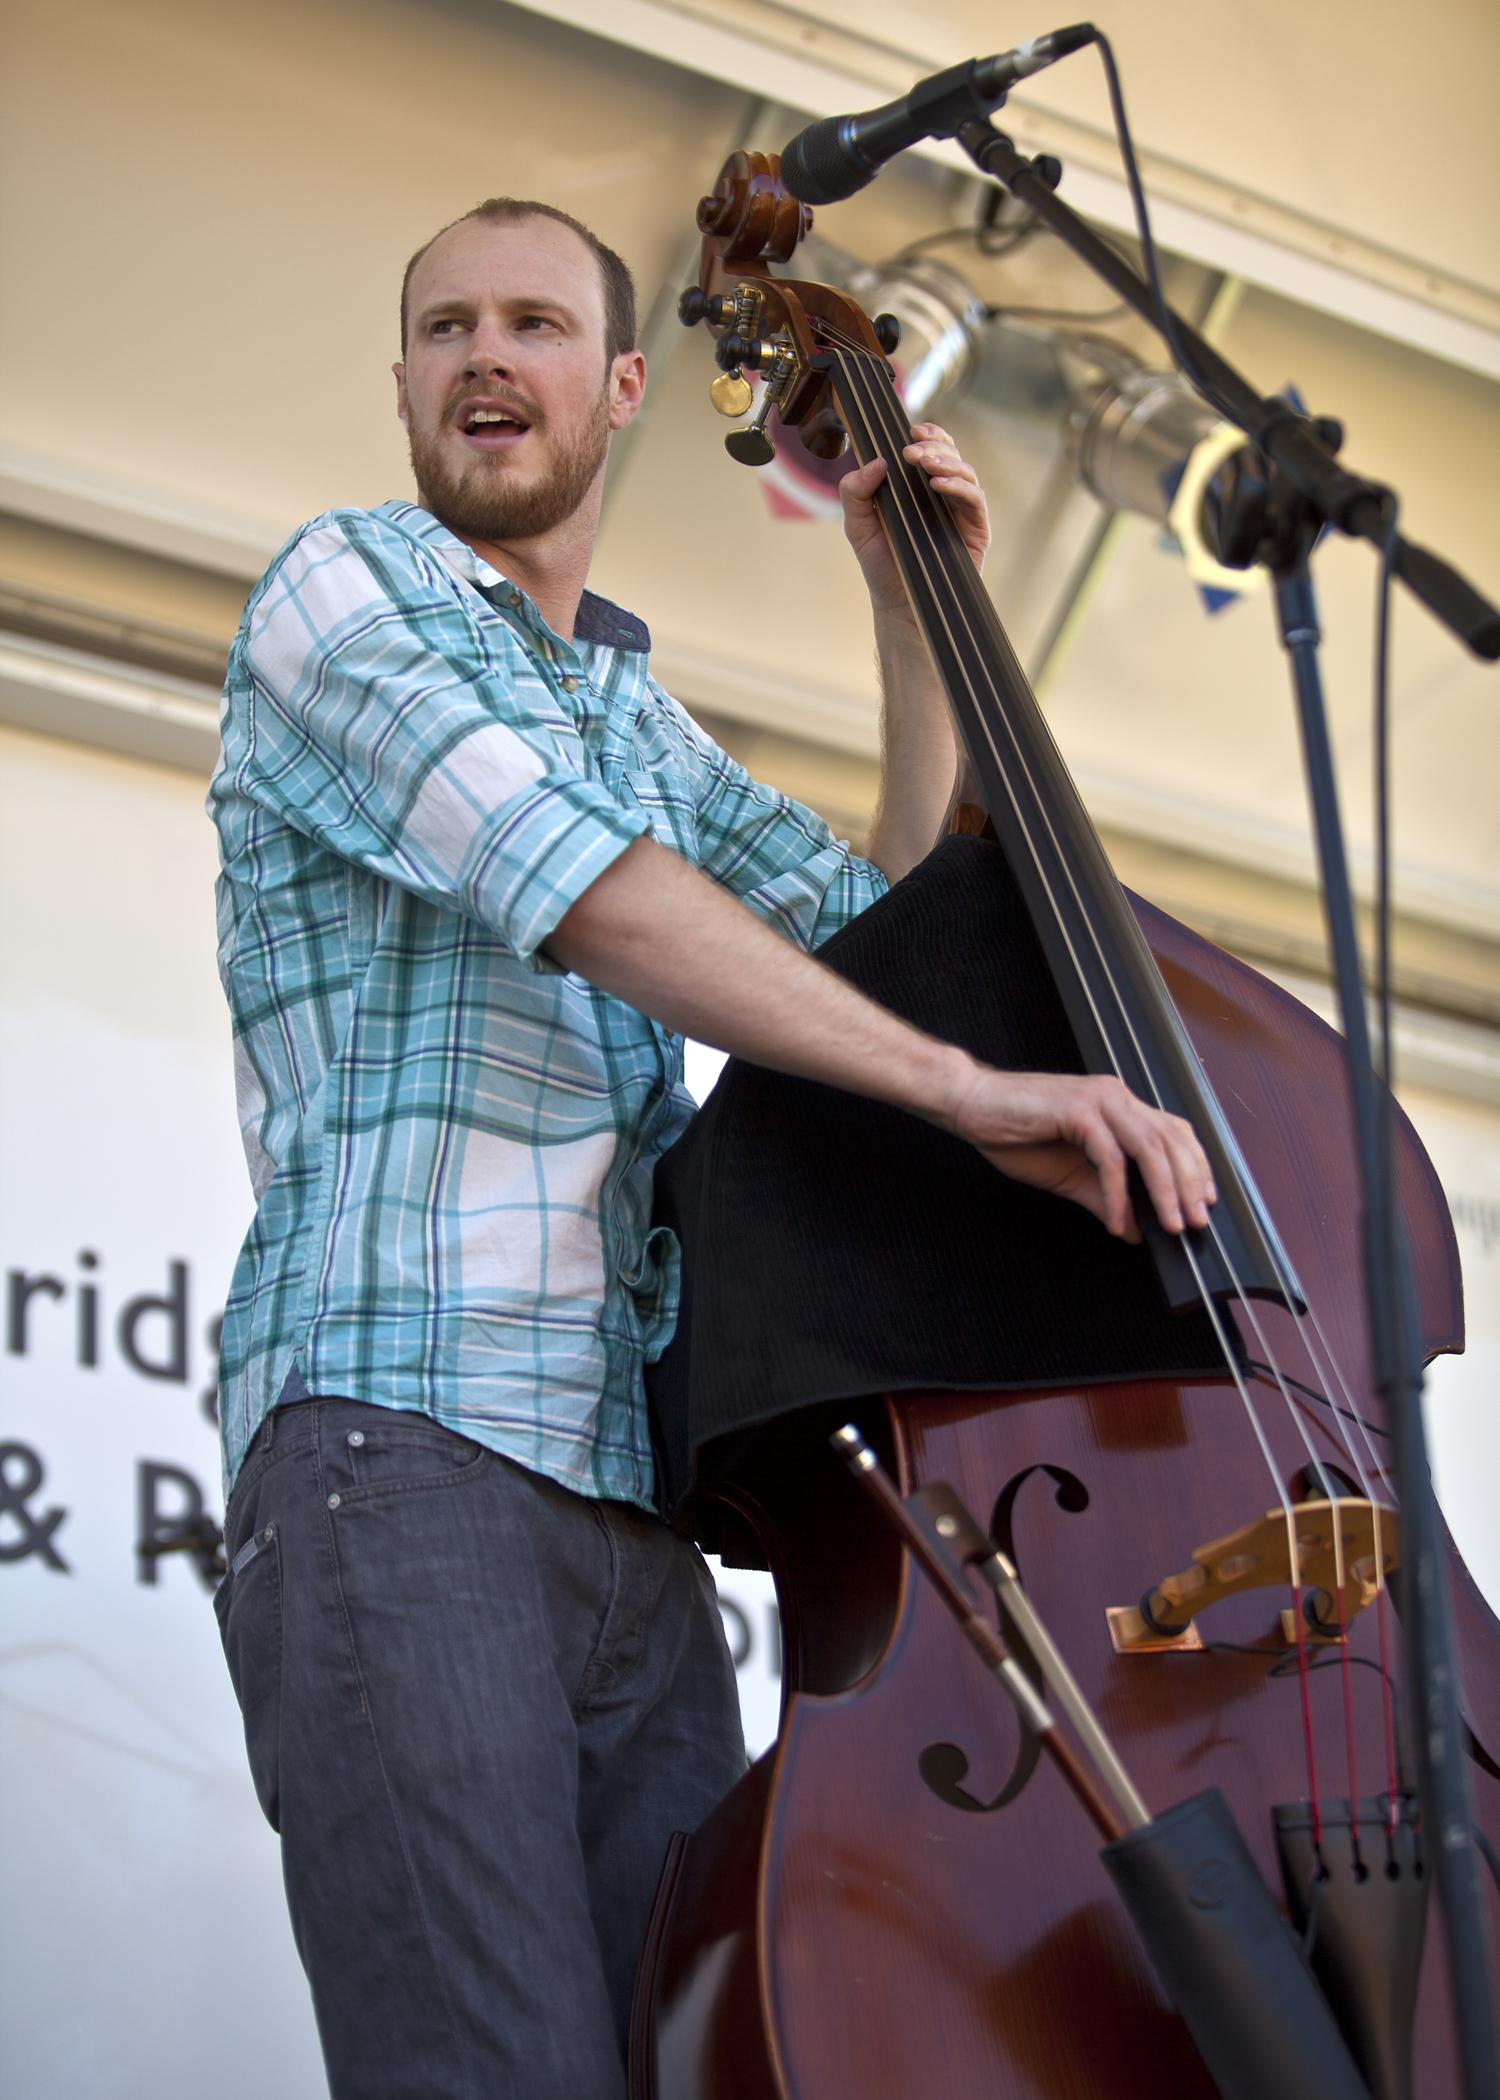 Andrew Knapp, bass player of the Warren G. Hardings, at the 2013 Bainbridge Island Bluegrass Festival.